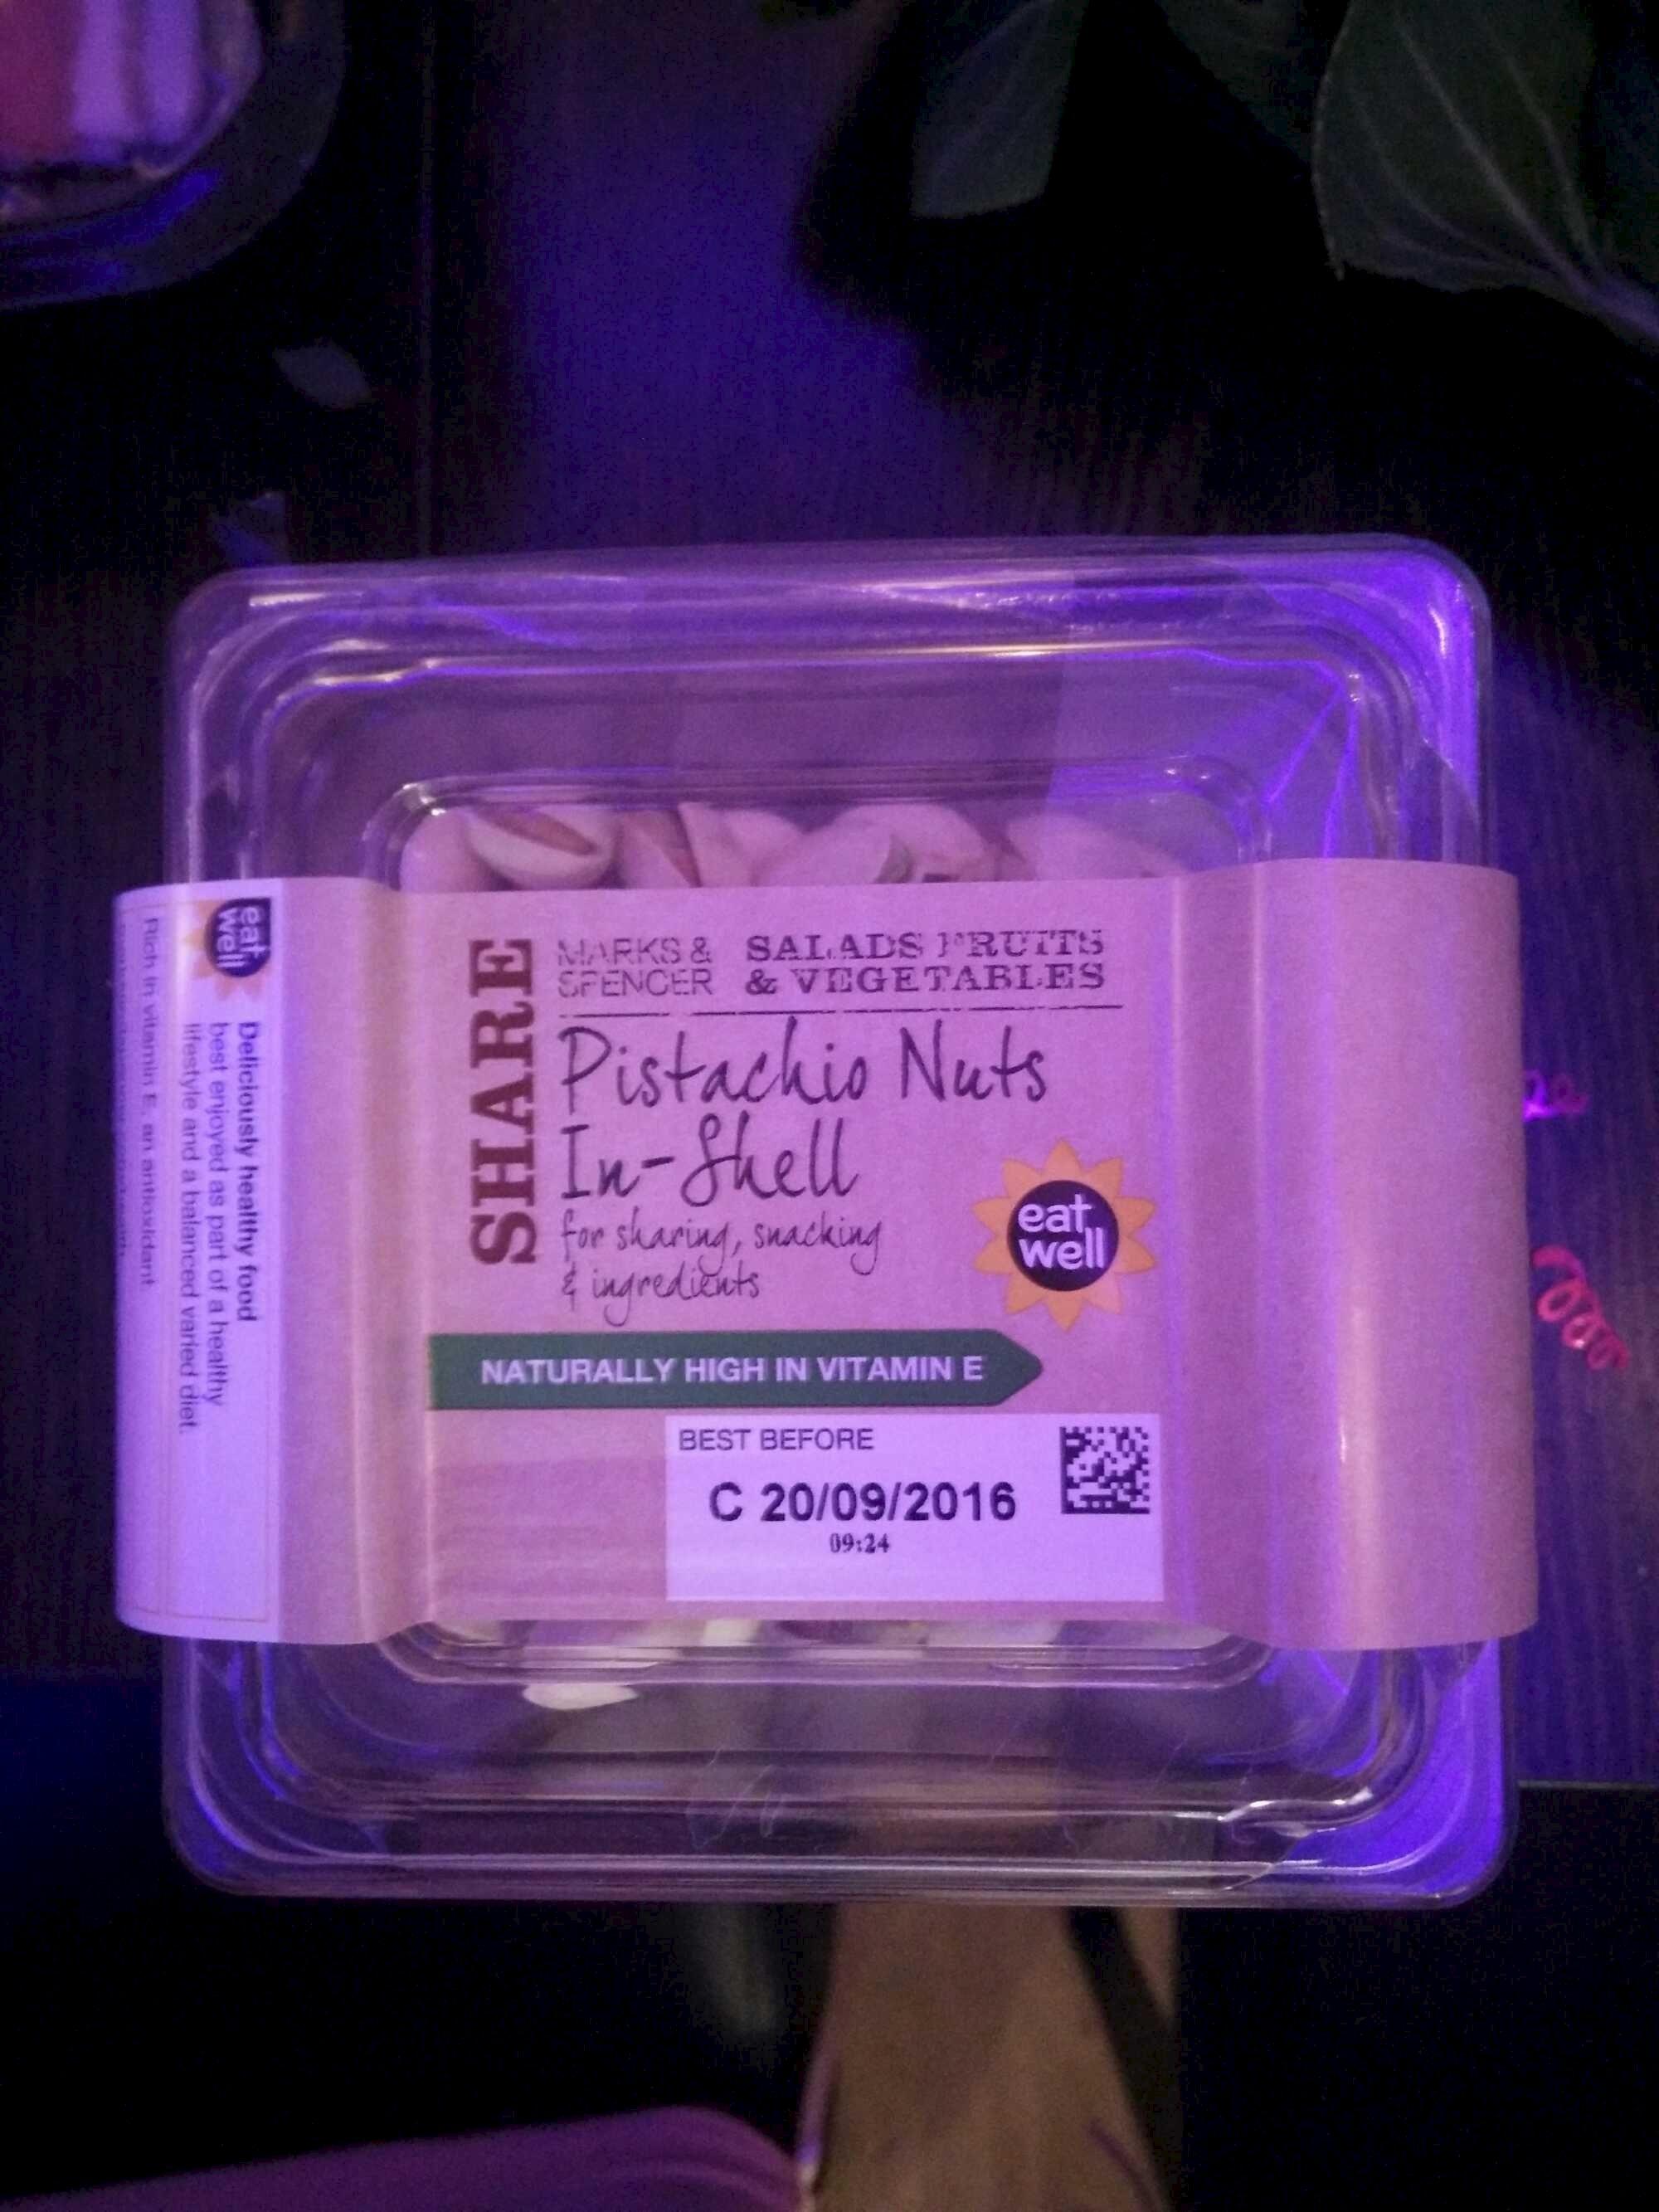 Pistachio nuts in-shell - Product - en